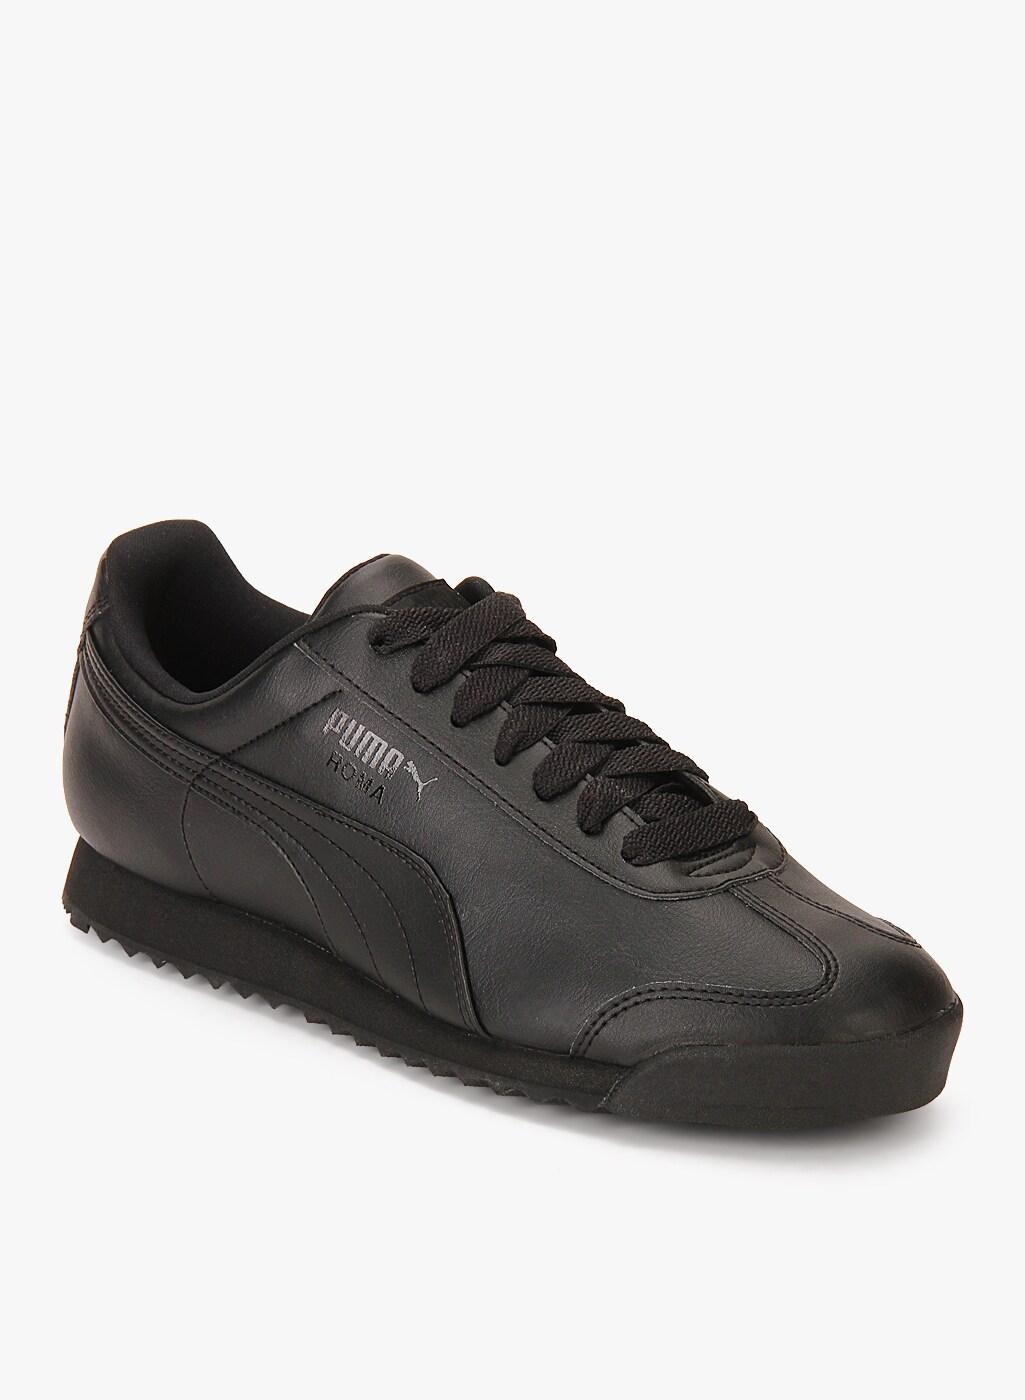 Sneaker Puma Roma - Buy Sneaker Puma Roma online in India b5b6b8d23